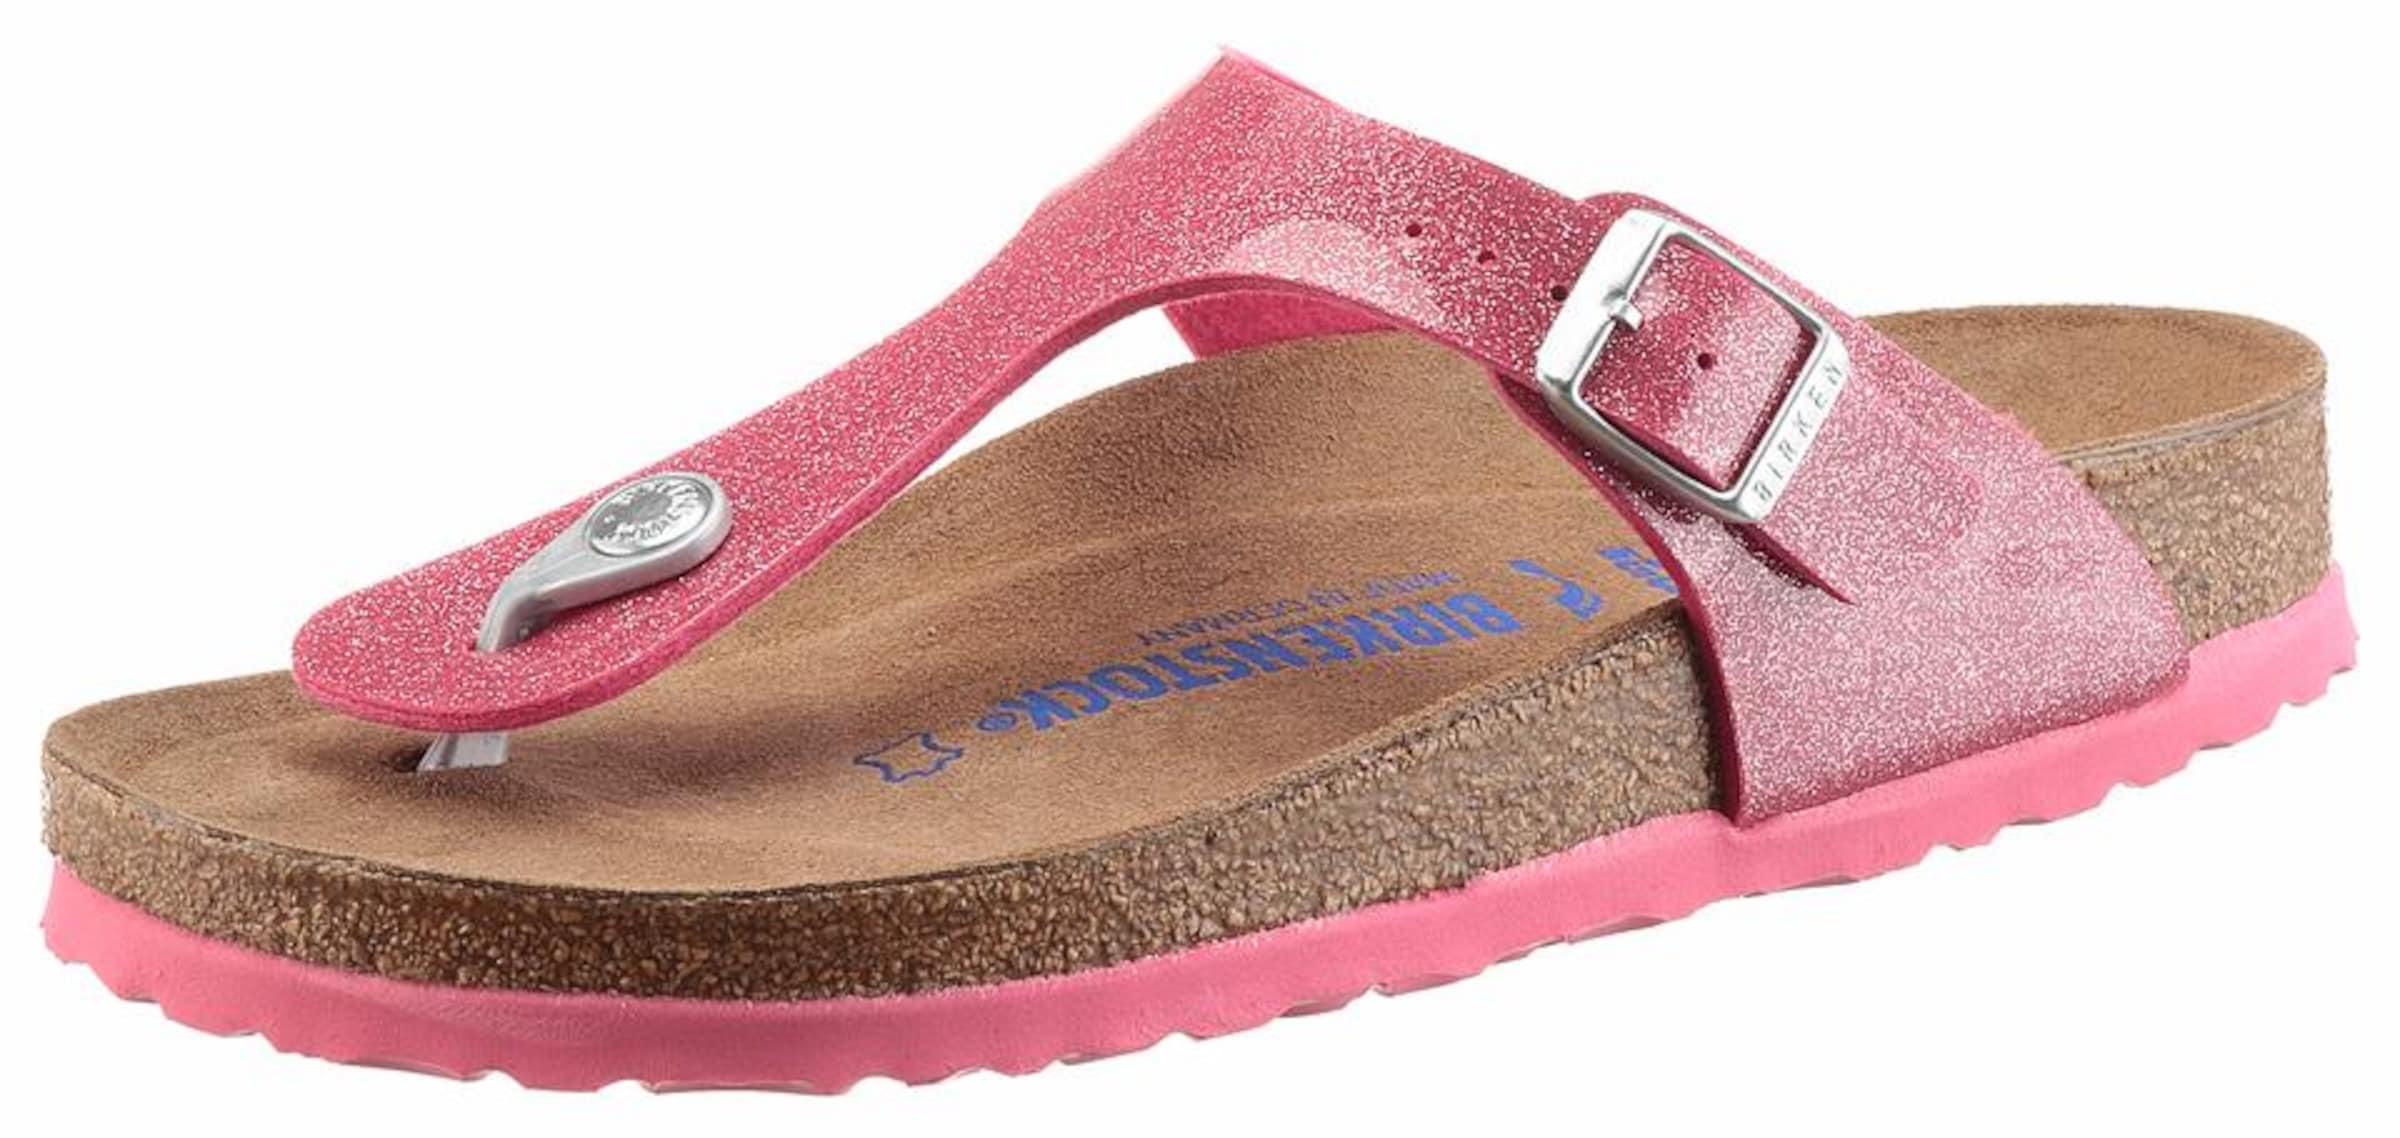 Haltbare Mode billige Schuhe BIRKENSTOCK   Zehentrenner 'Gizeh' Schuhe Gut getragene Schuhe